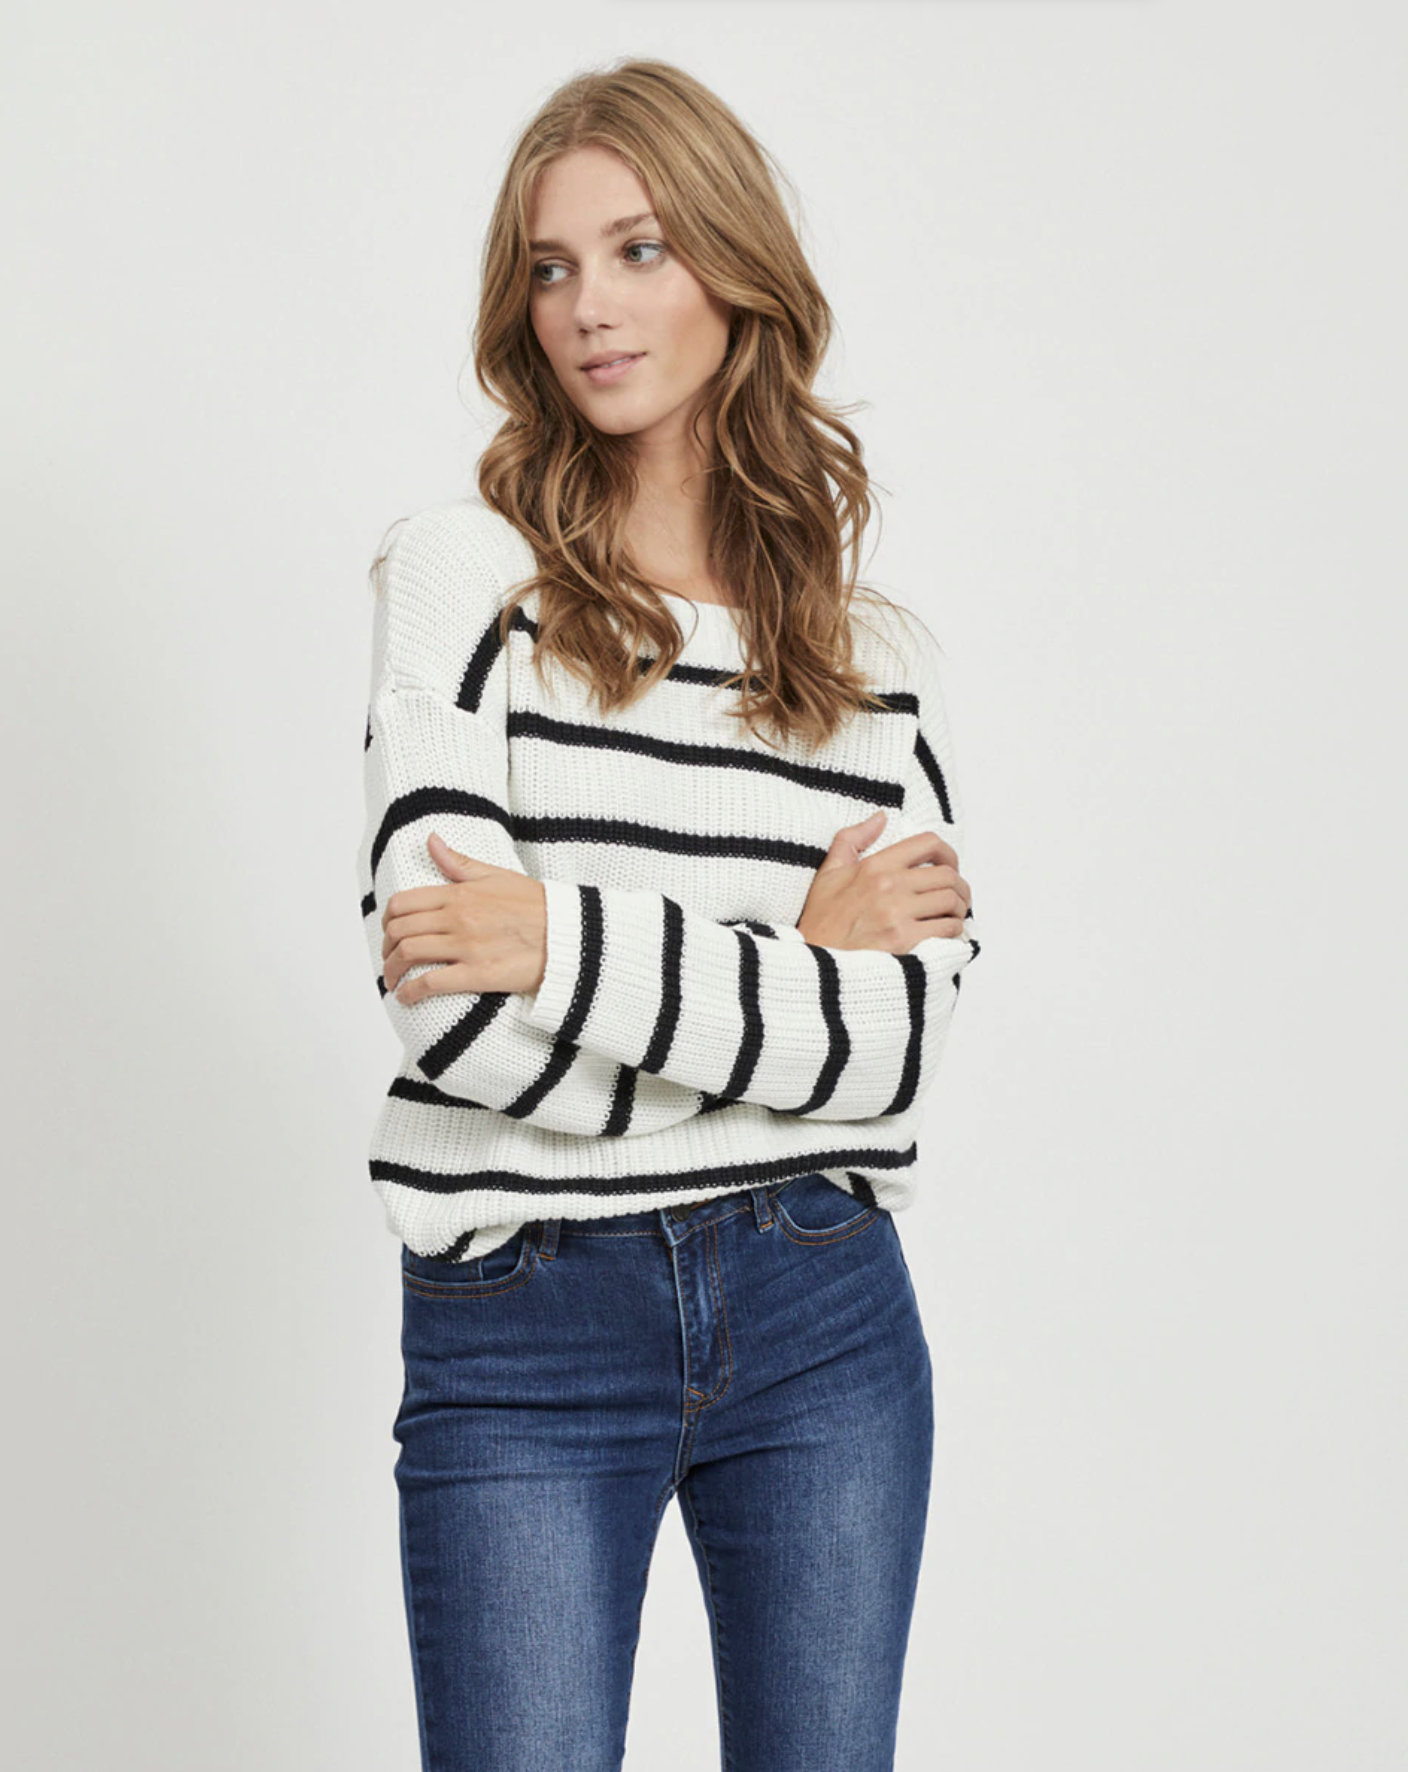 Jersey de mujer de manga larga con rayas